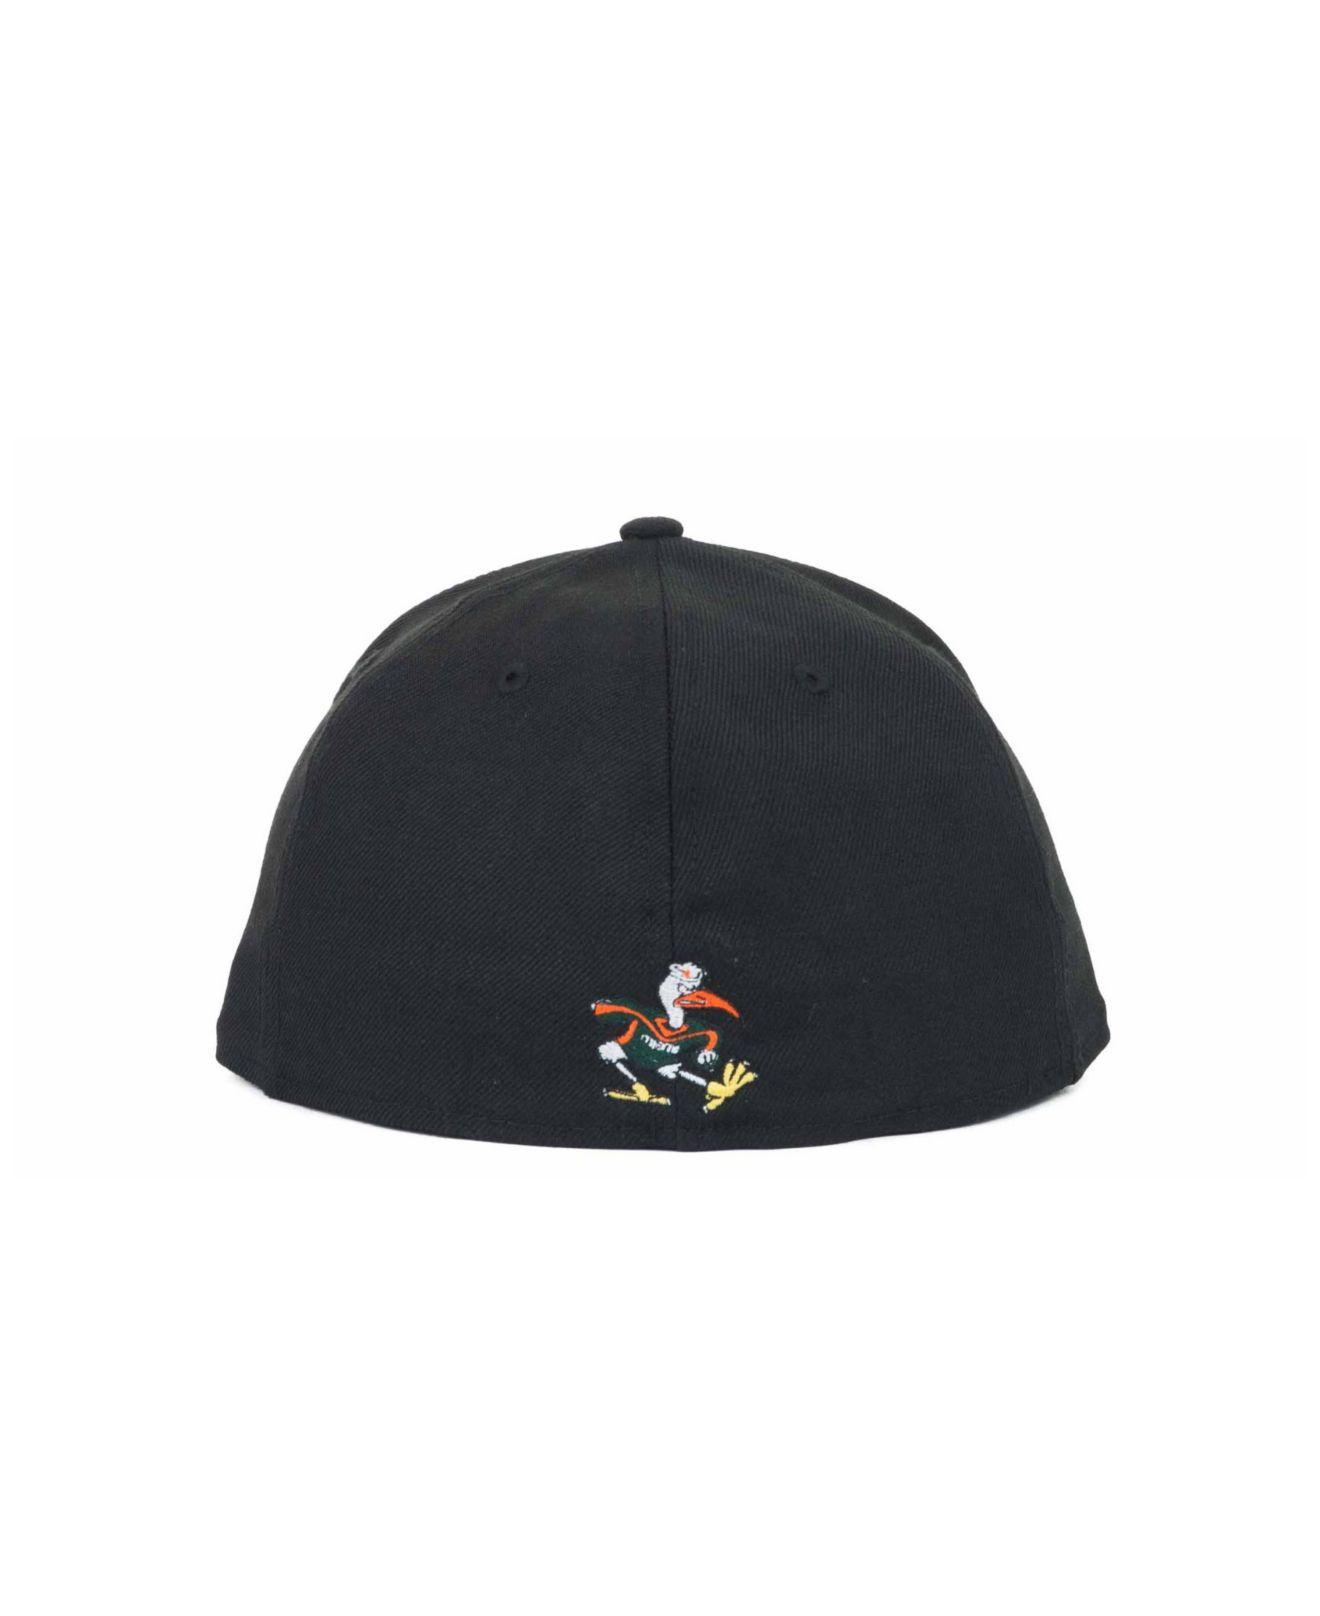 online retailer a12a9 168a4 ... 2 tone 59fifty cap fabulous 7d8e8 7bbd6  real miami hurricanes new era  ncaa black on black with white 59fifty cap black 323db ec54e